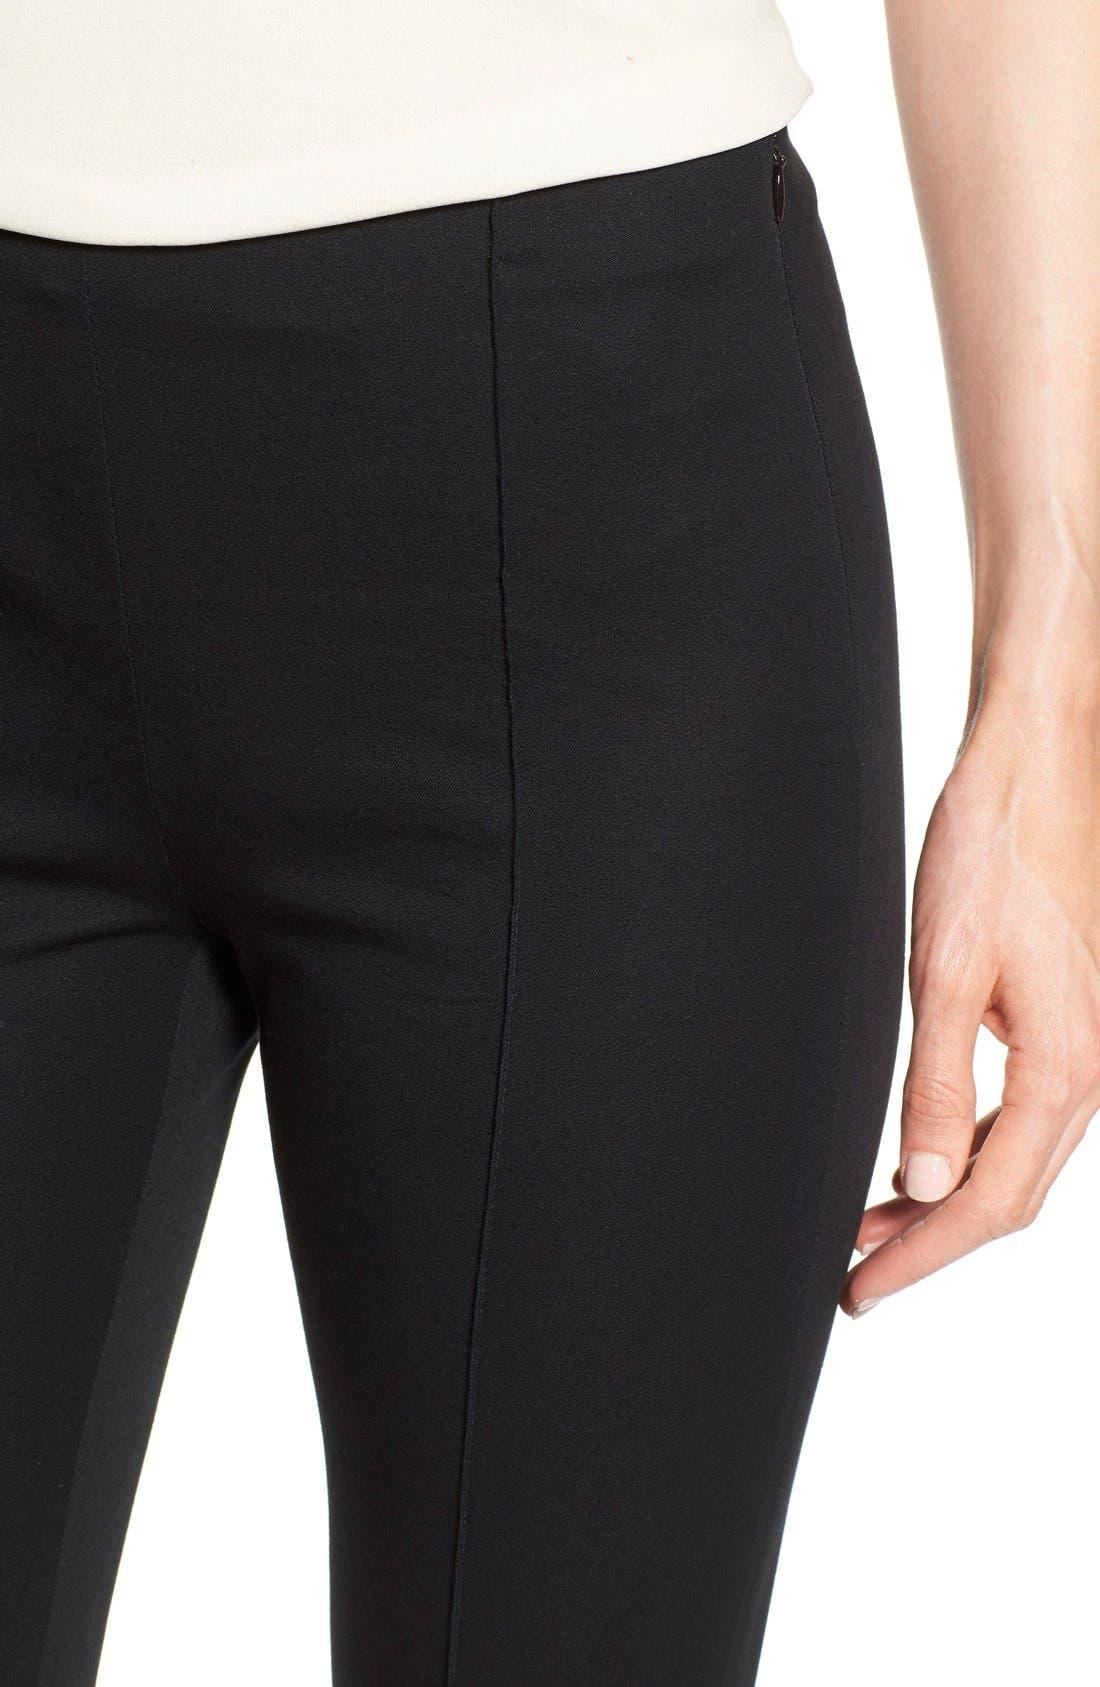 Alternate Image 4  - MICHAEL Michael Kors 'Hutton' Ankle Zip Slim Pintuck Pants (Petite)